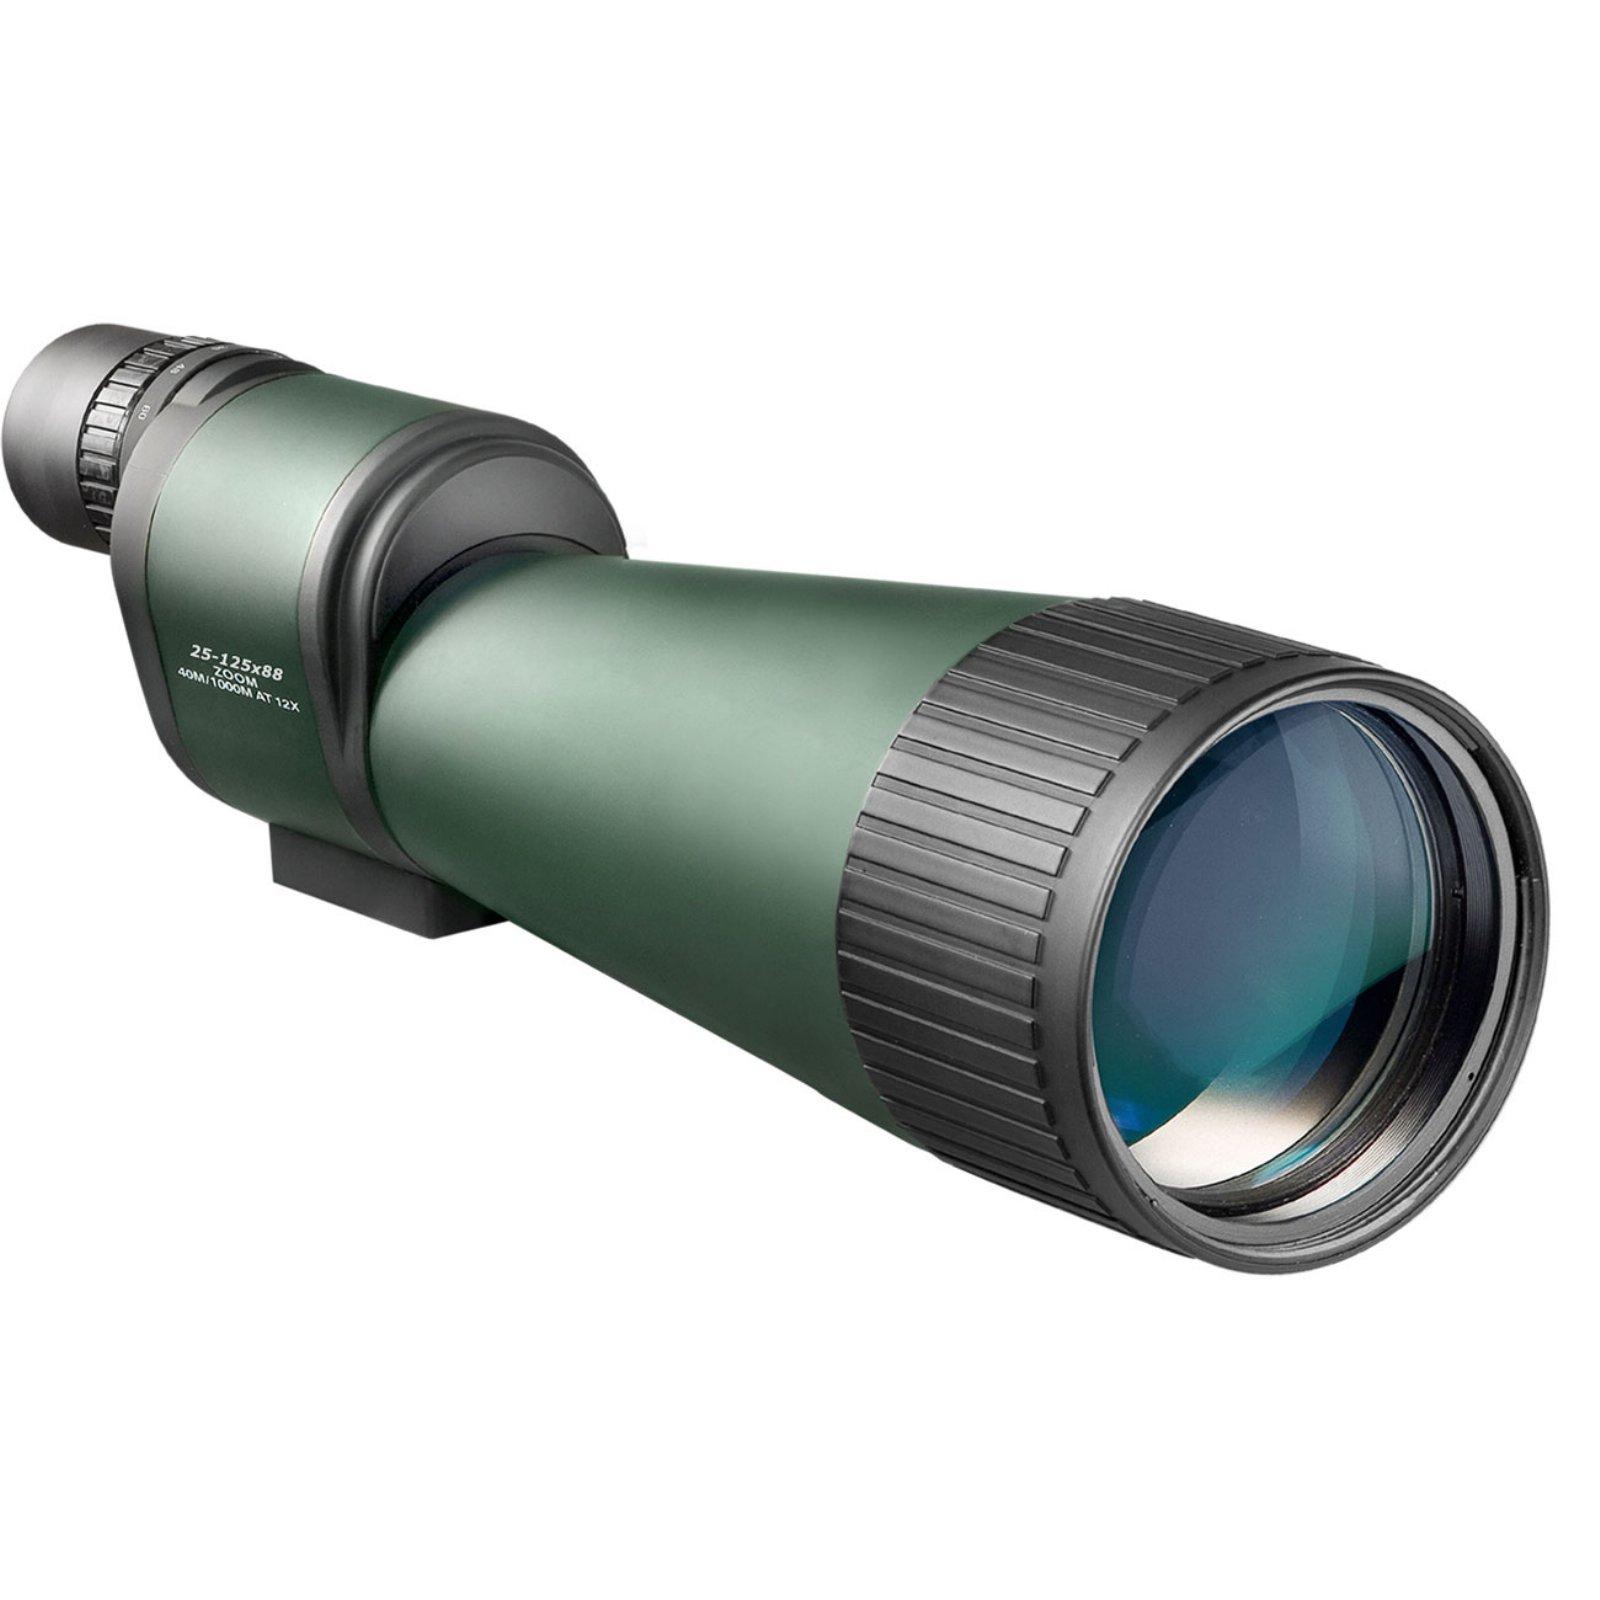 Barska 25-125x88 Benchmark Waterproof Spotting Scope